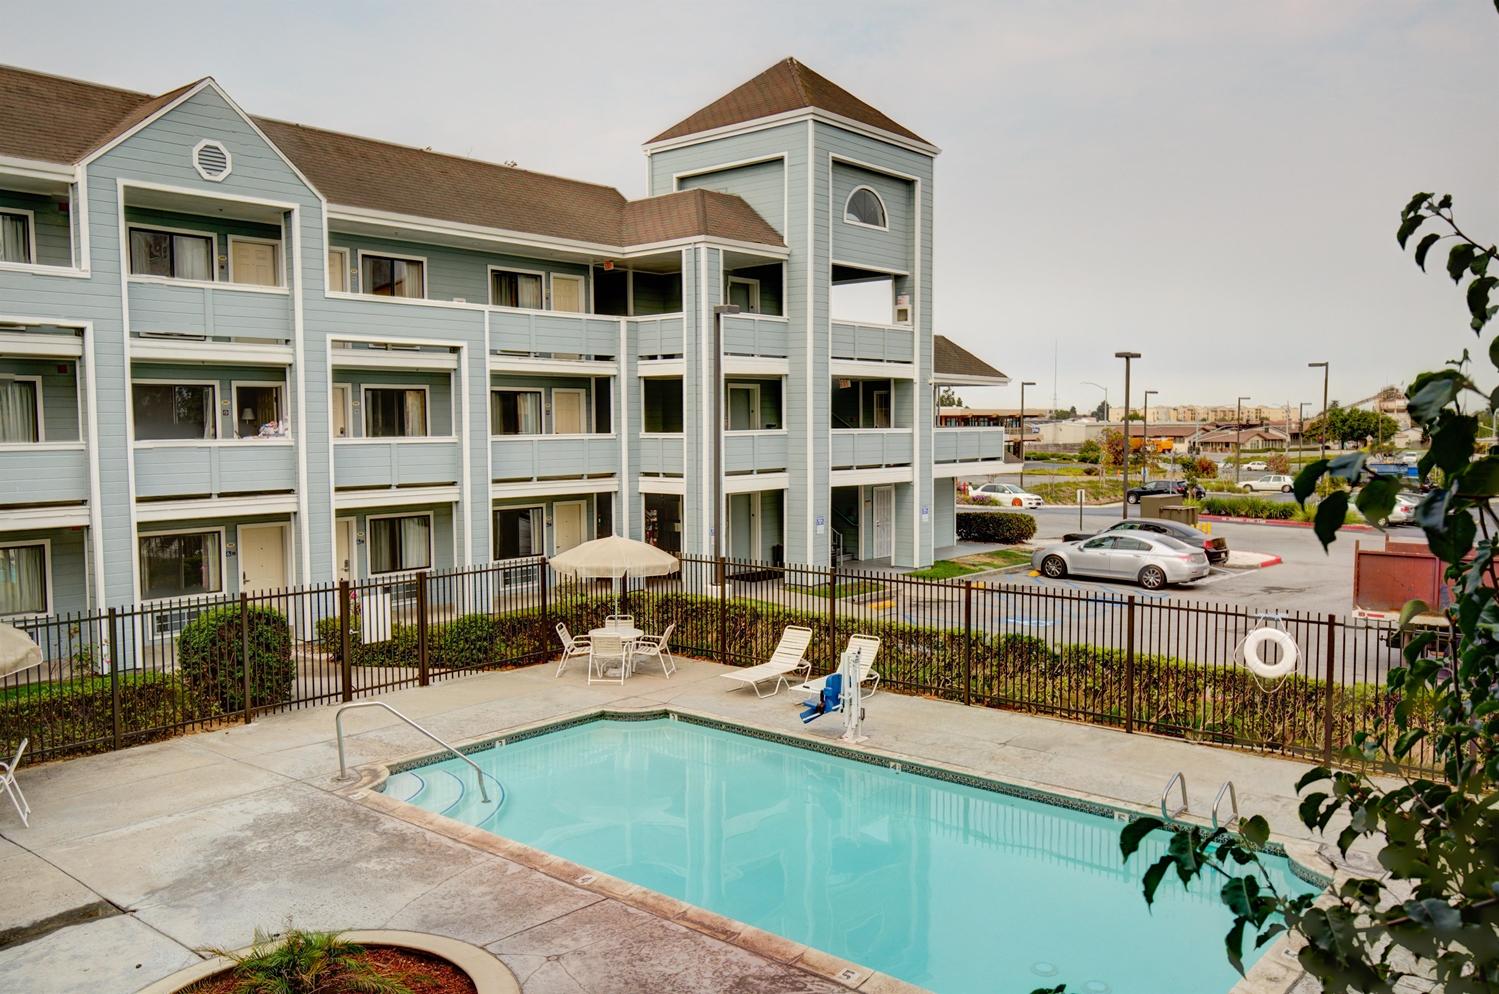 Pool - Good Nite Inn Salinas